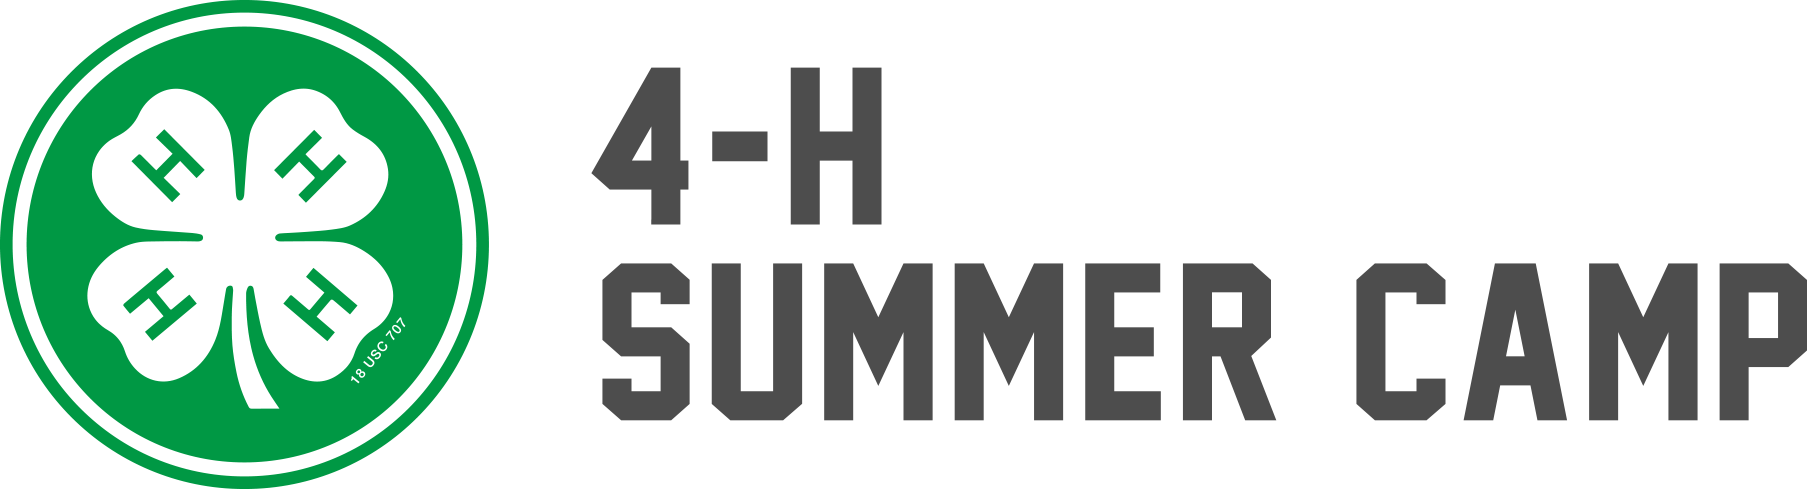 4-H Summer Camp